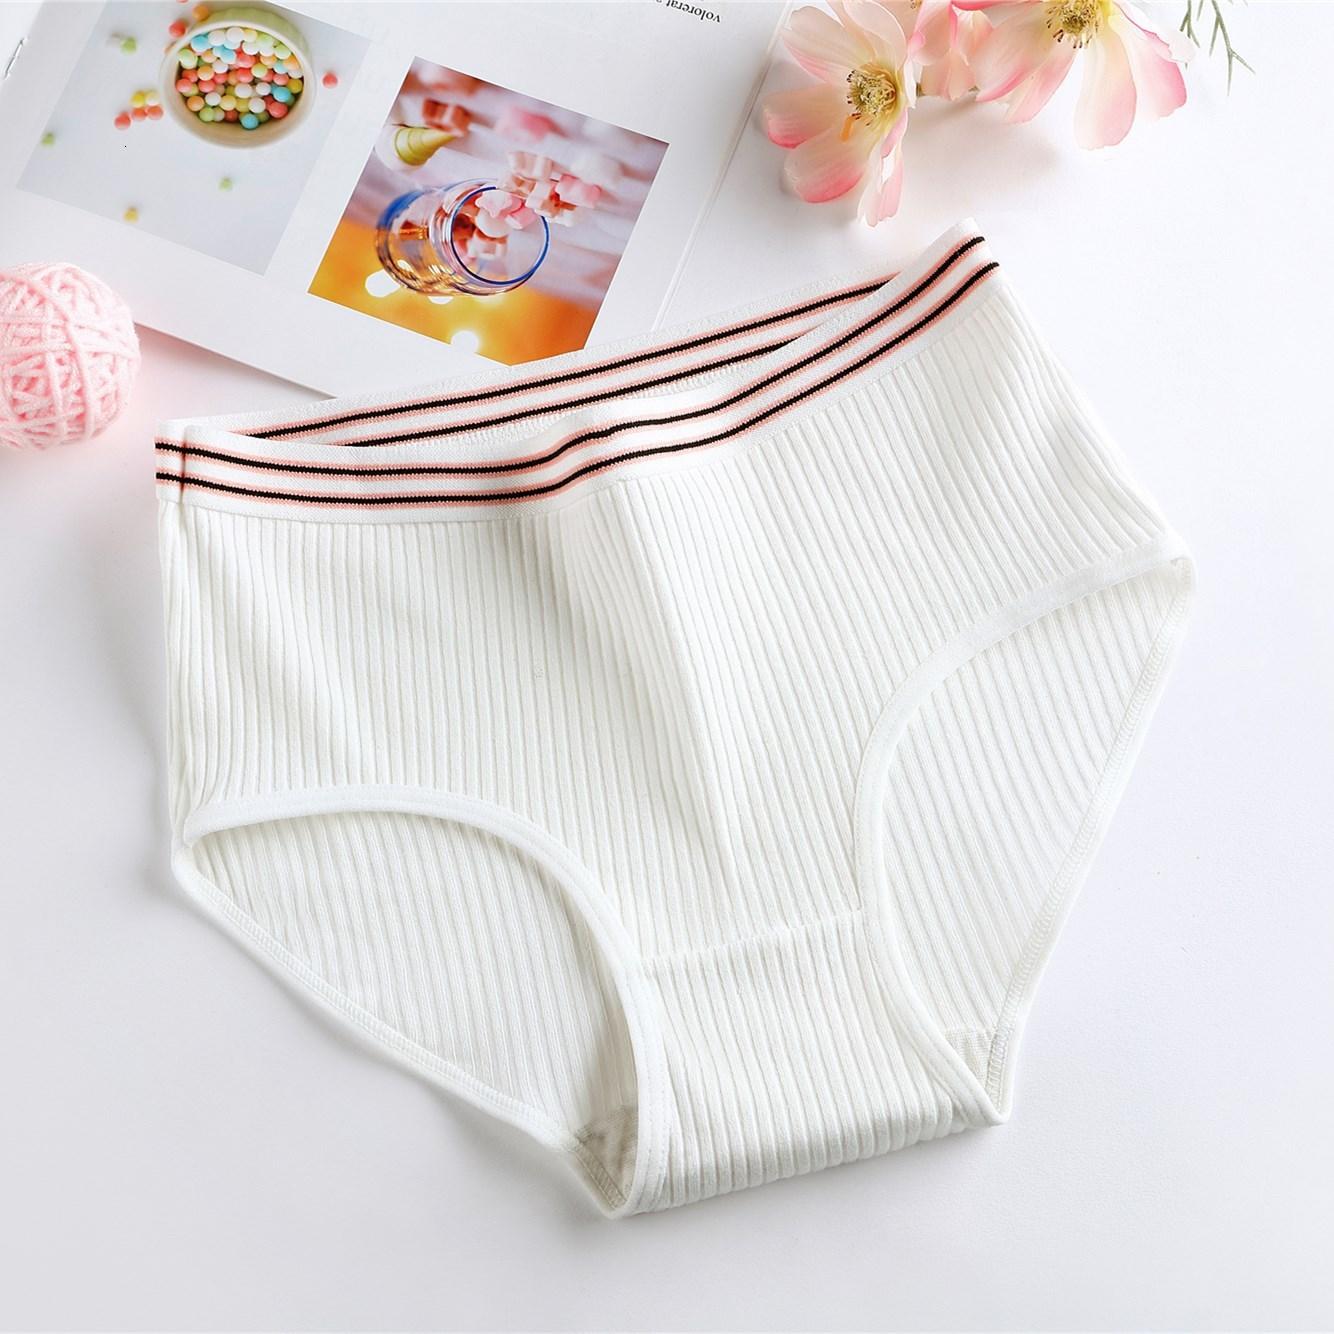 3 PCS Underwear Women Girls Panties Plus Size Briefs Sexy Panties Women Lingeries Calcinhas Shorts Underpants Solid Panty